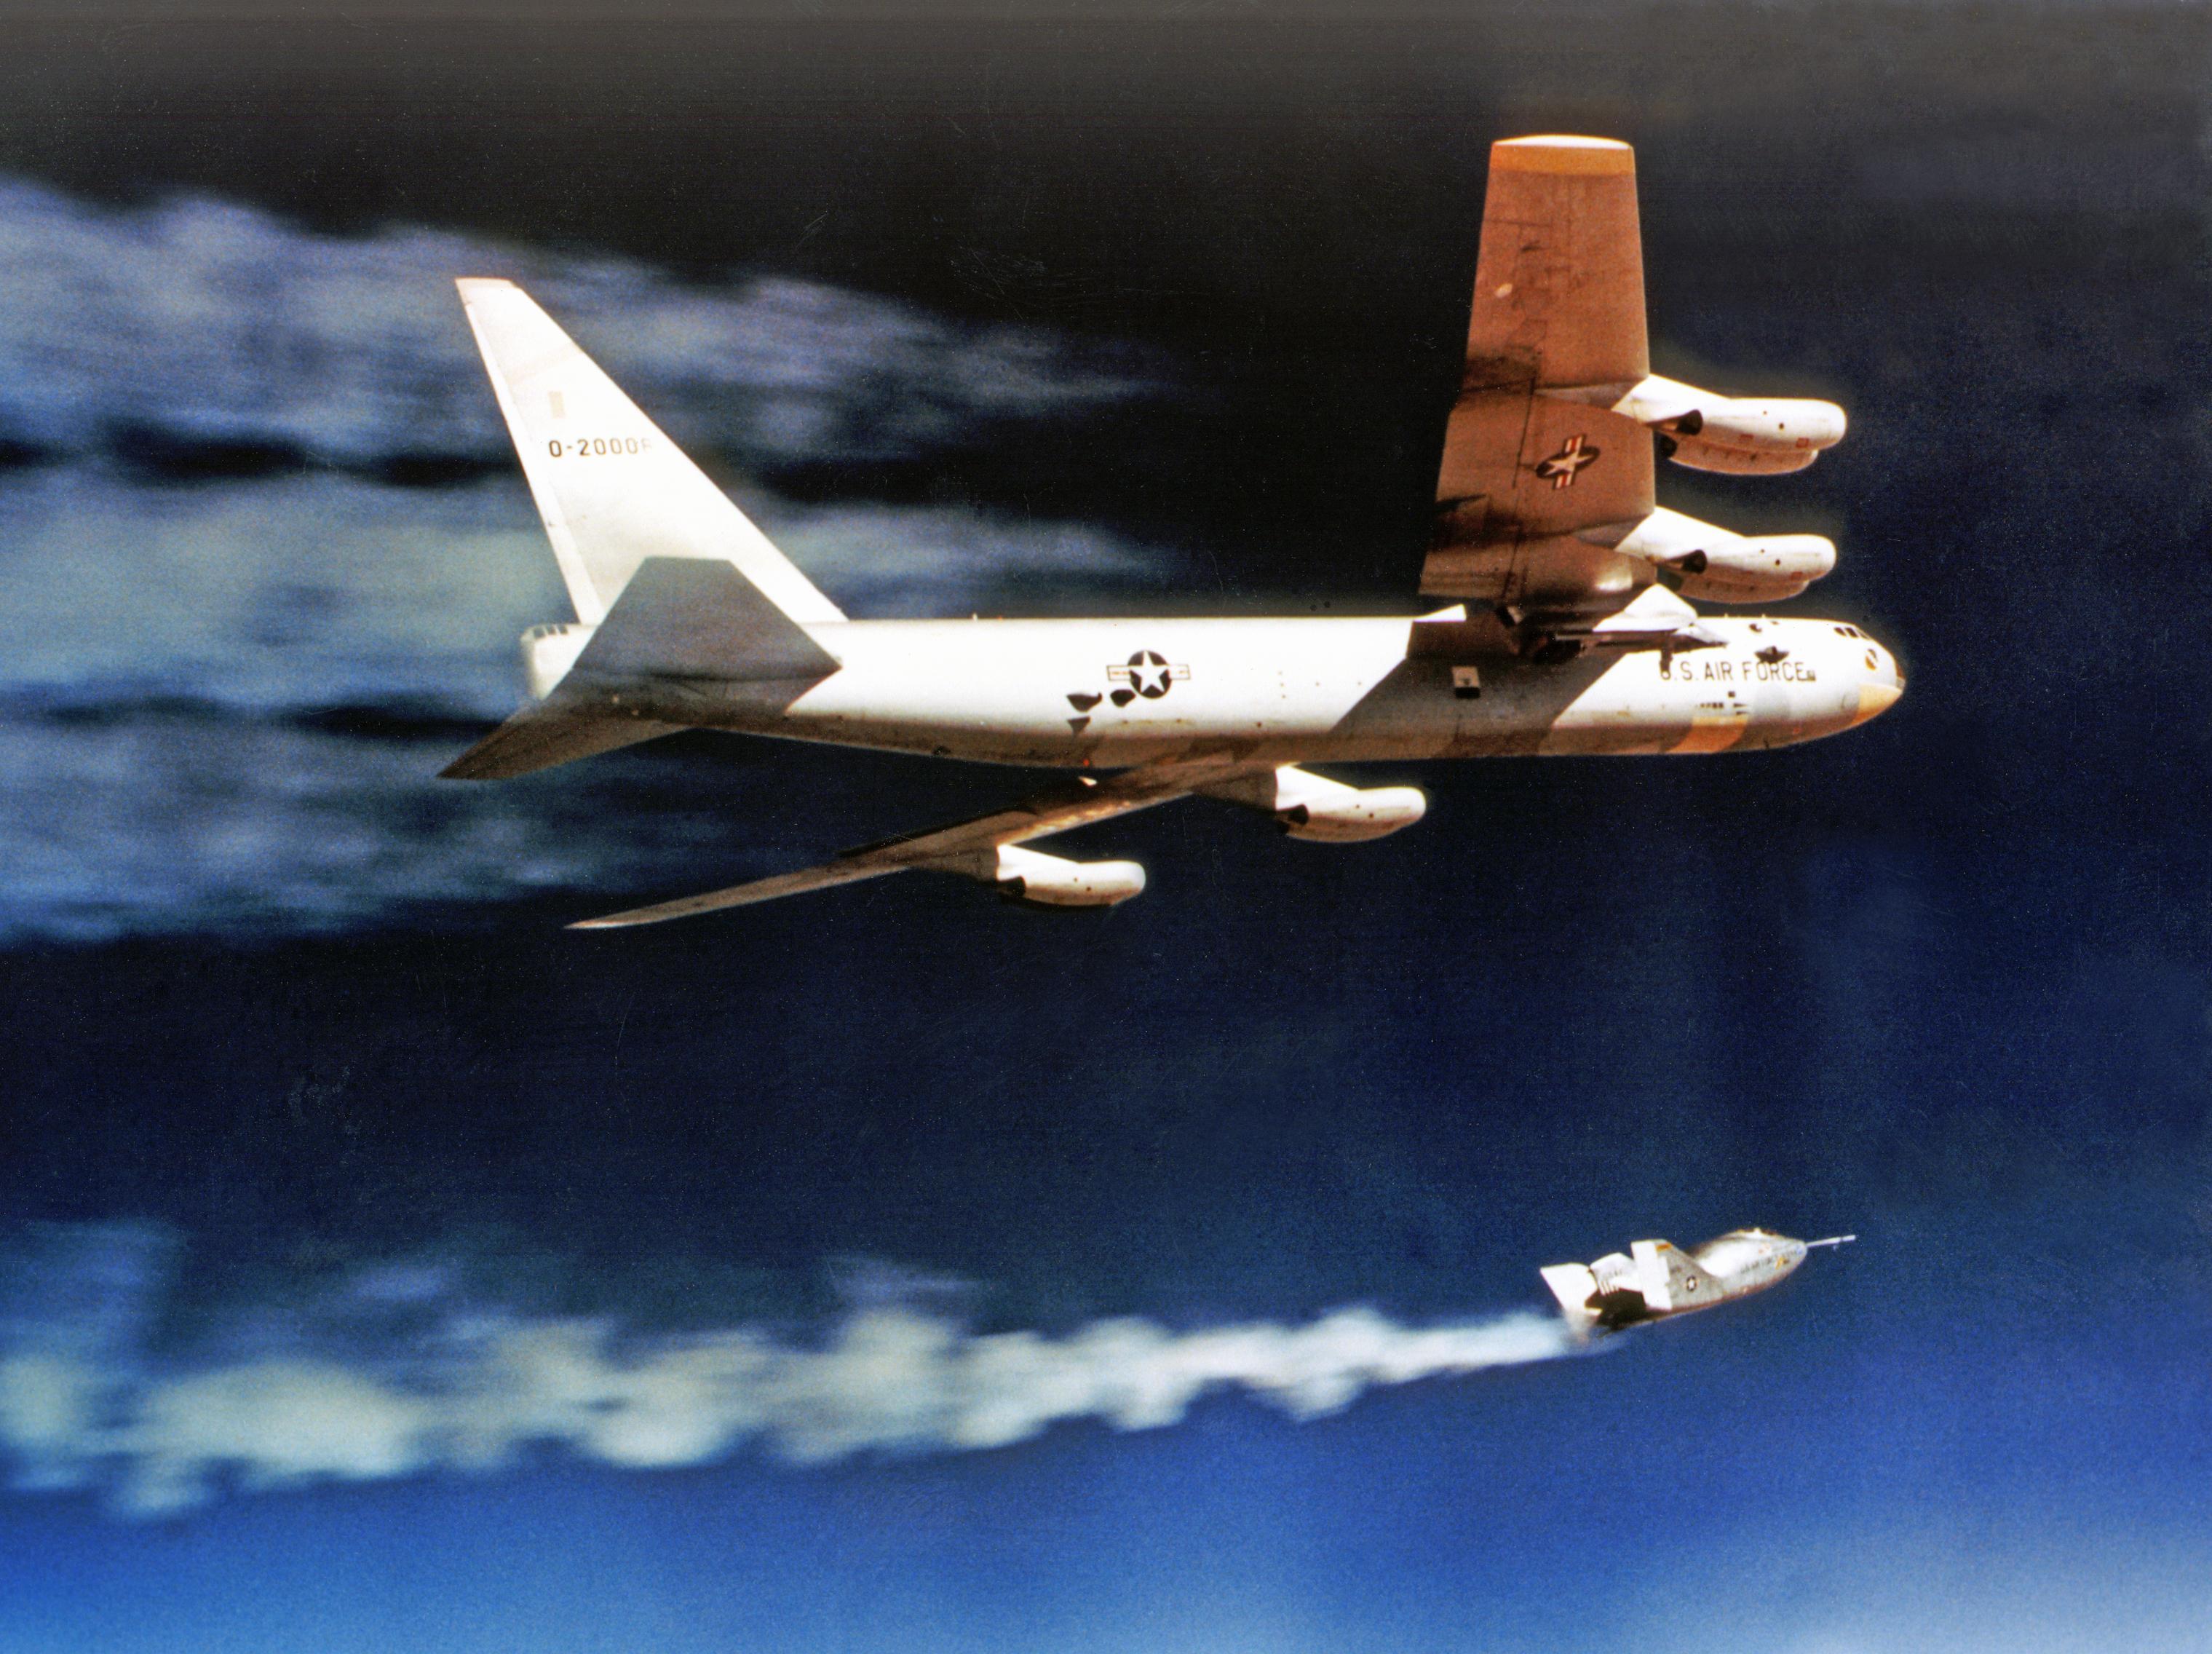 nasa b-52 - photo #26